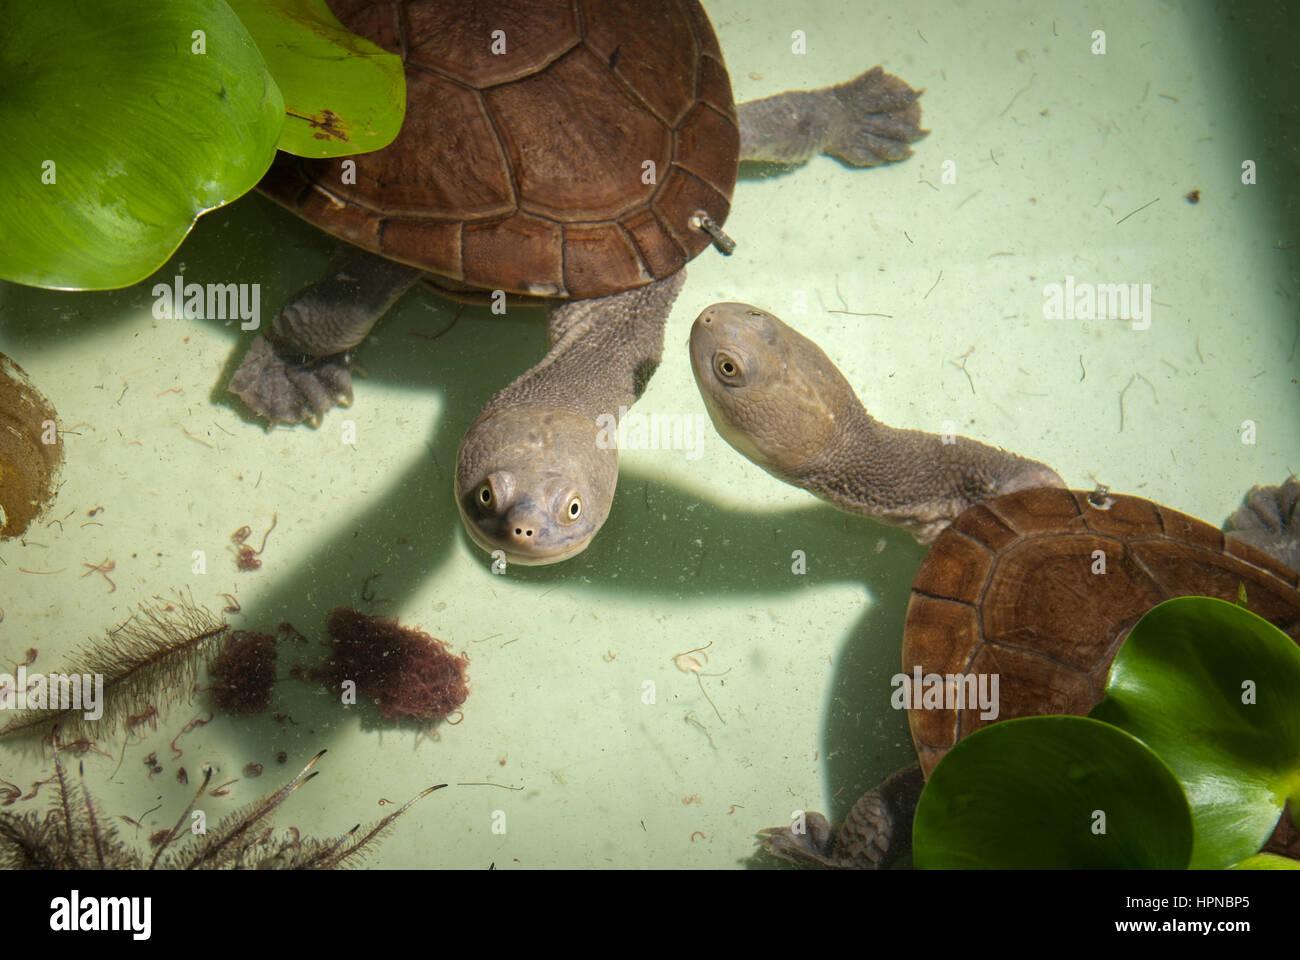 Rote Island snake-neck turtles (Chelodina mccordi). - Stock Image